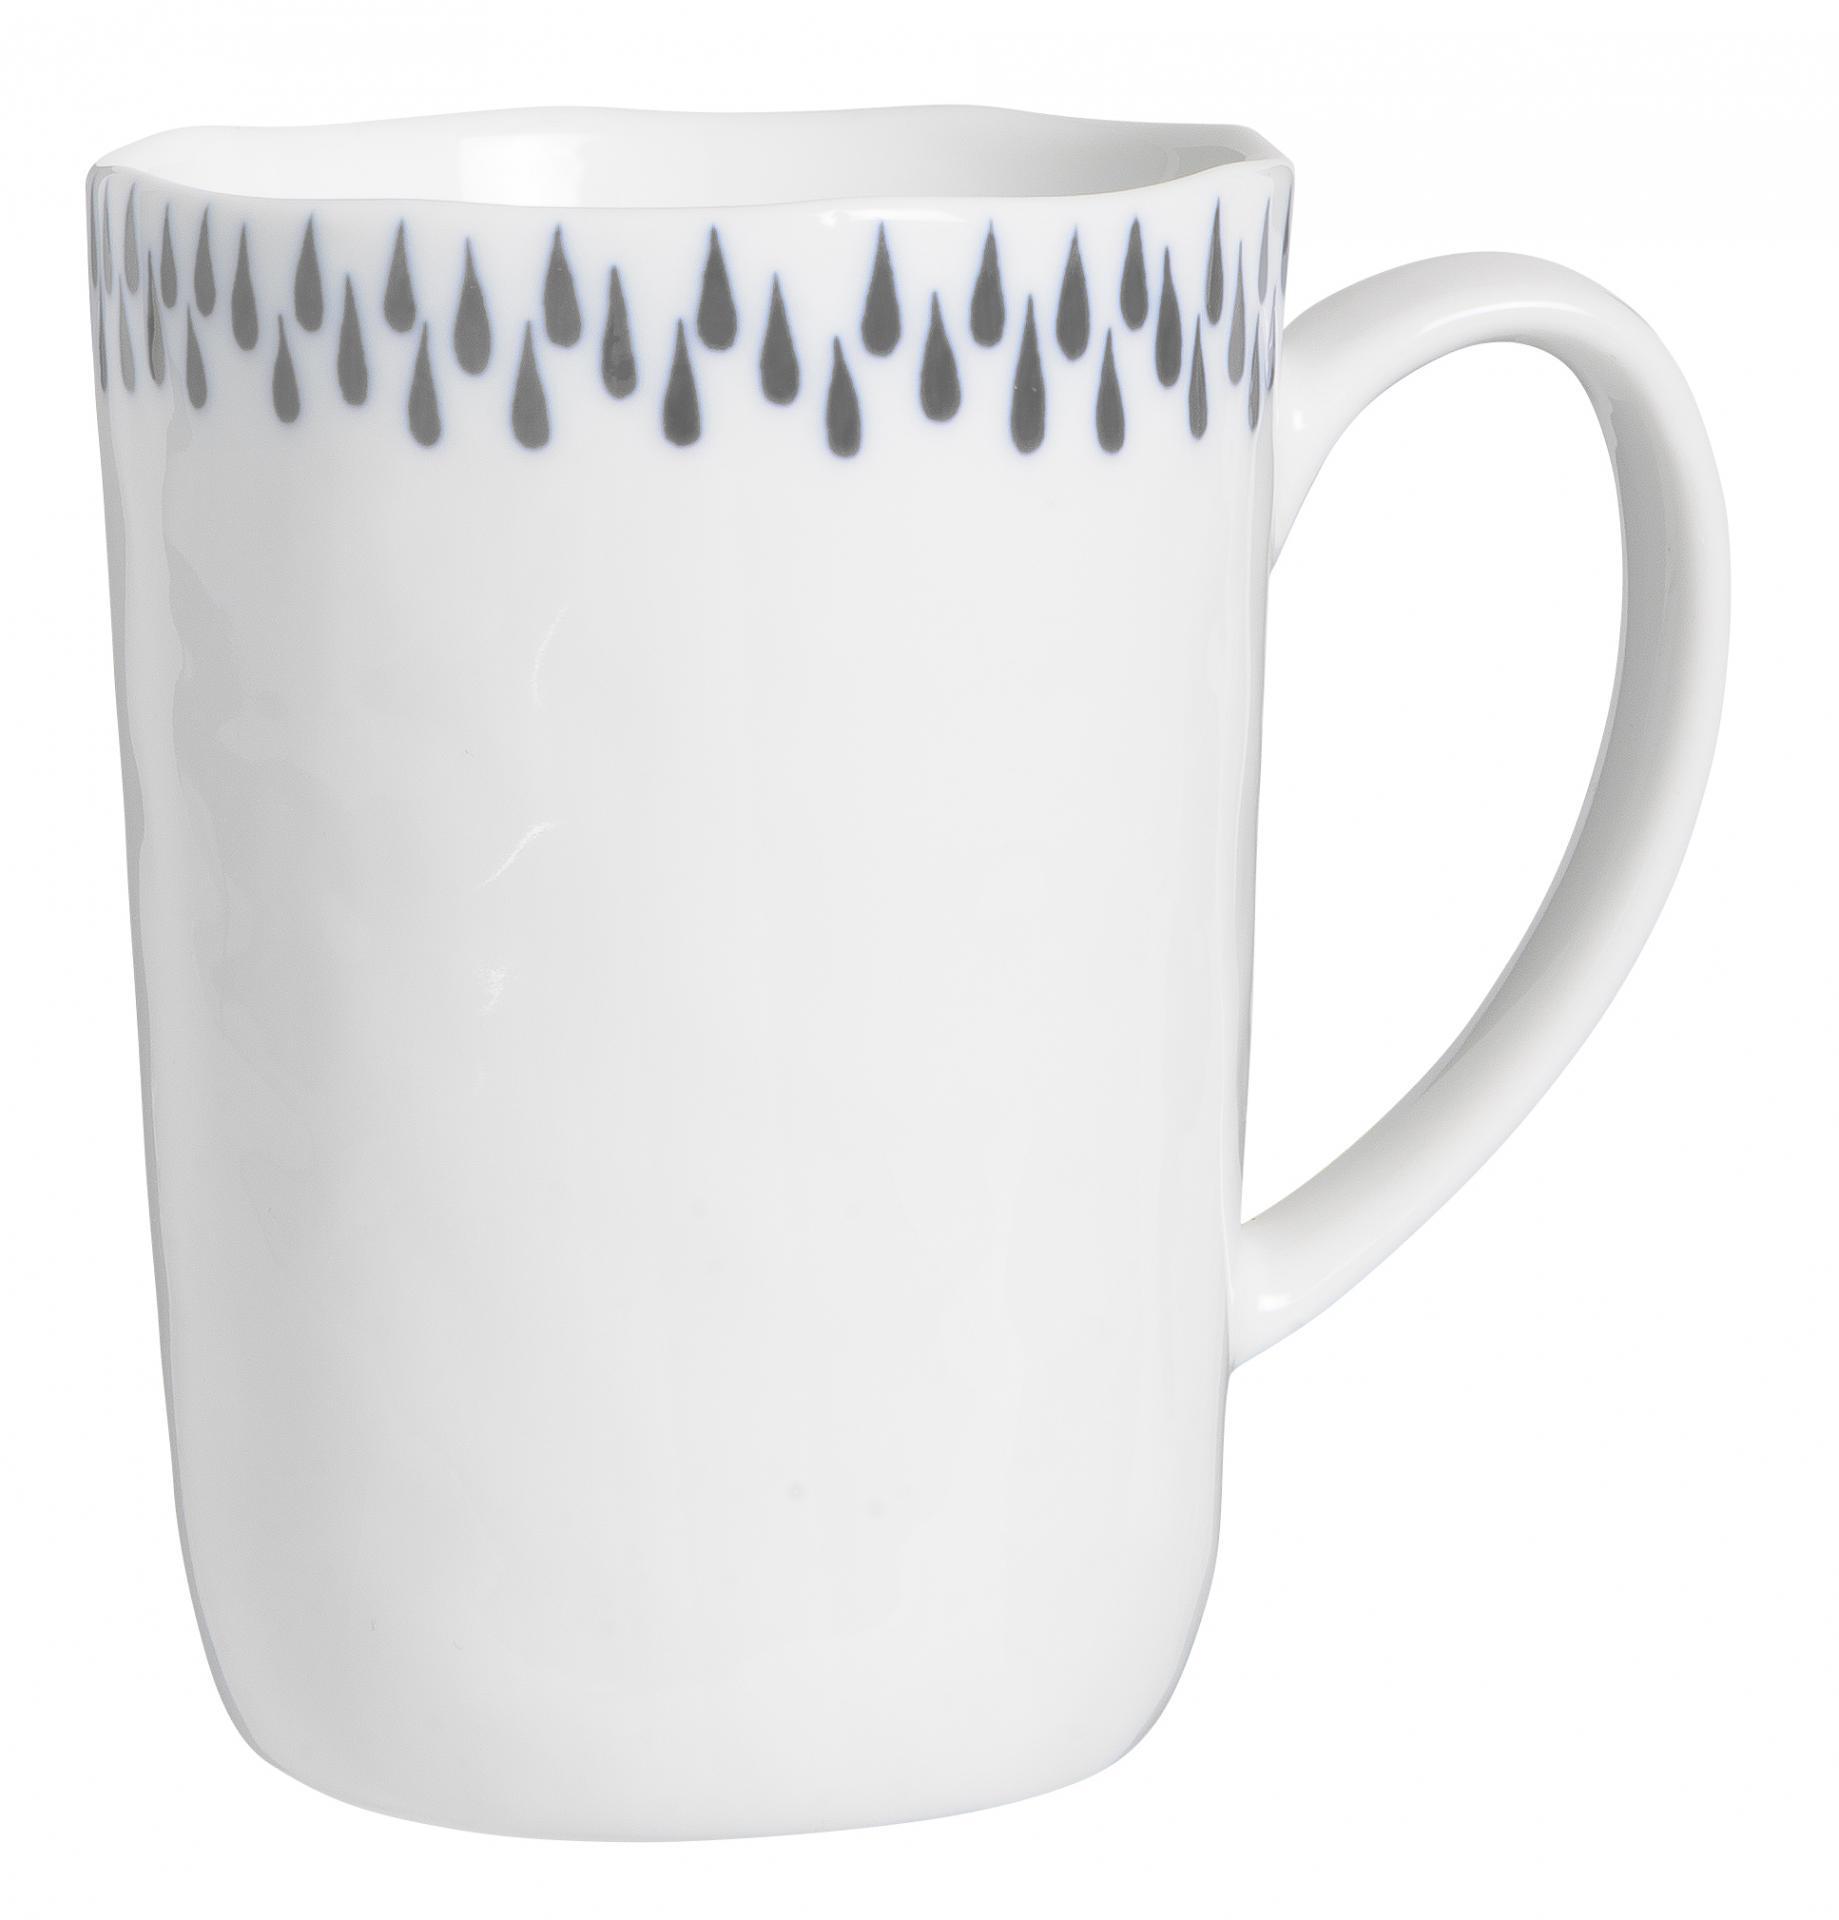 IB LAURSEN Porcelánový hrneček Delicate Grey 320ml, šedá barva, bílá barva, porcelán